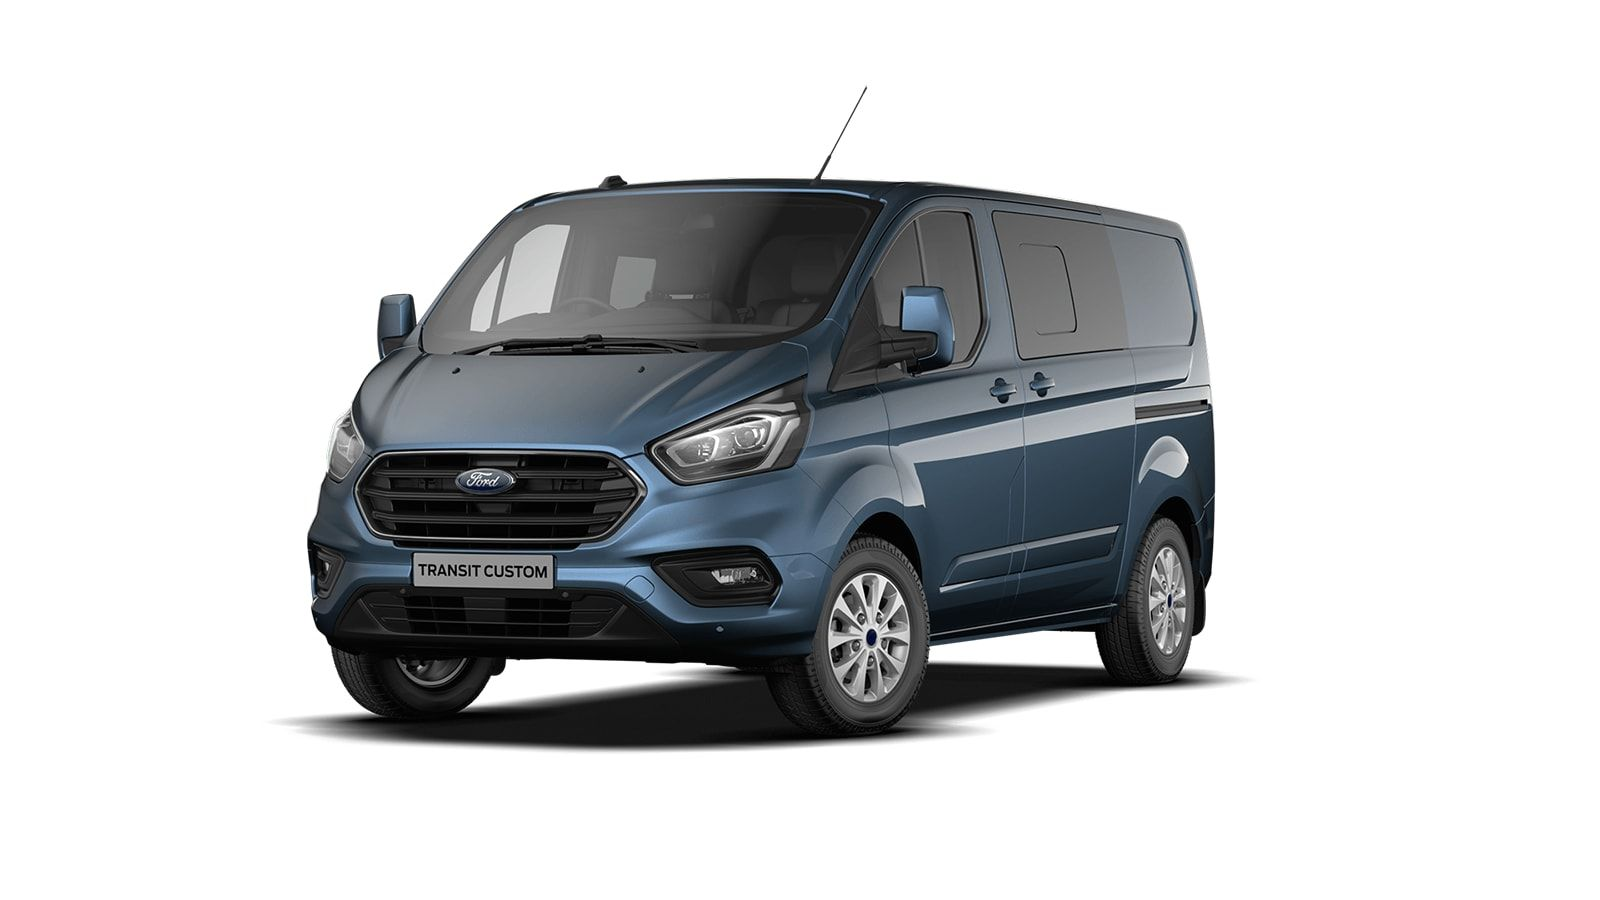 Demo Ford Transit custom 320L Multi use: bestelwagen met dubbele cabine L1 Limited MS BYB - Metaalkleur: Chrome Blue 1